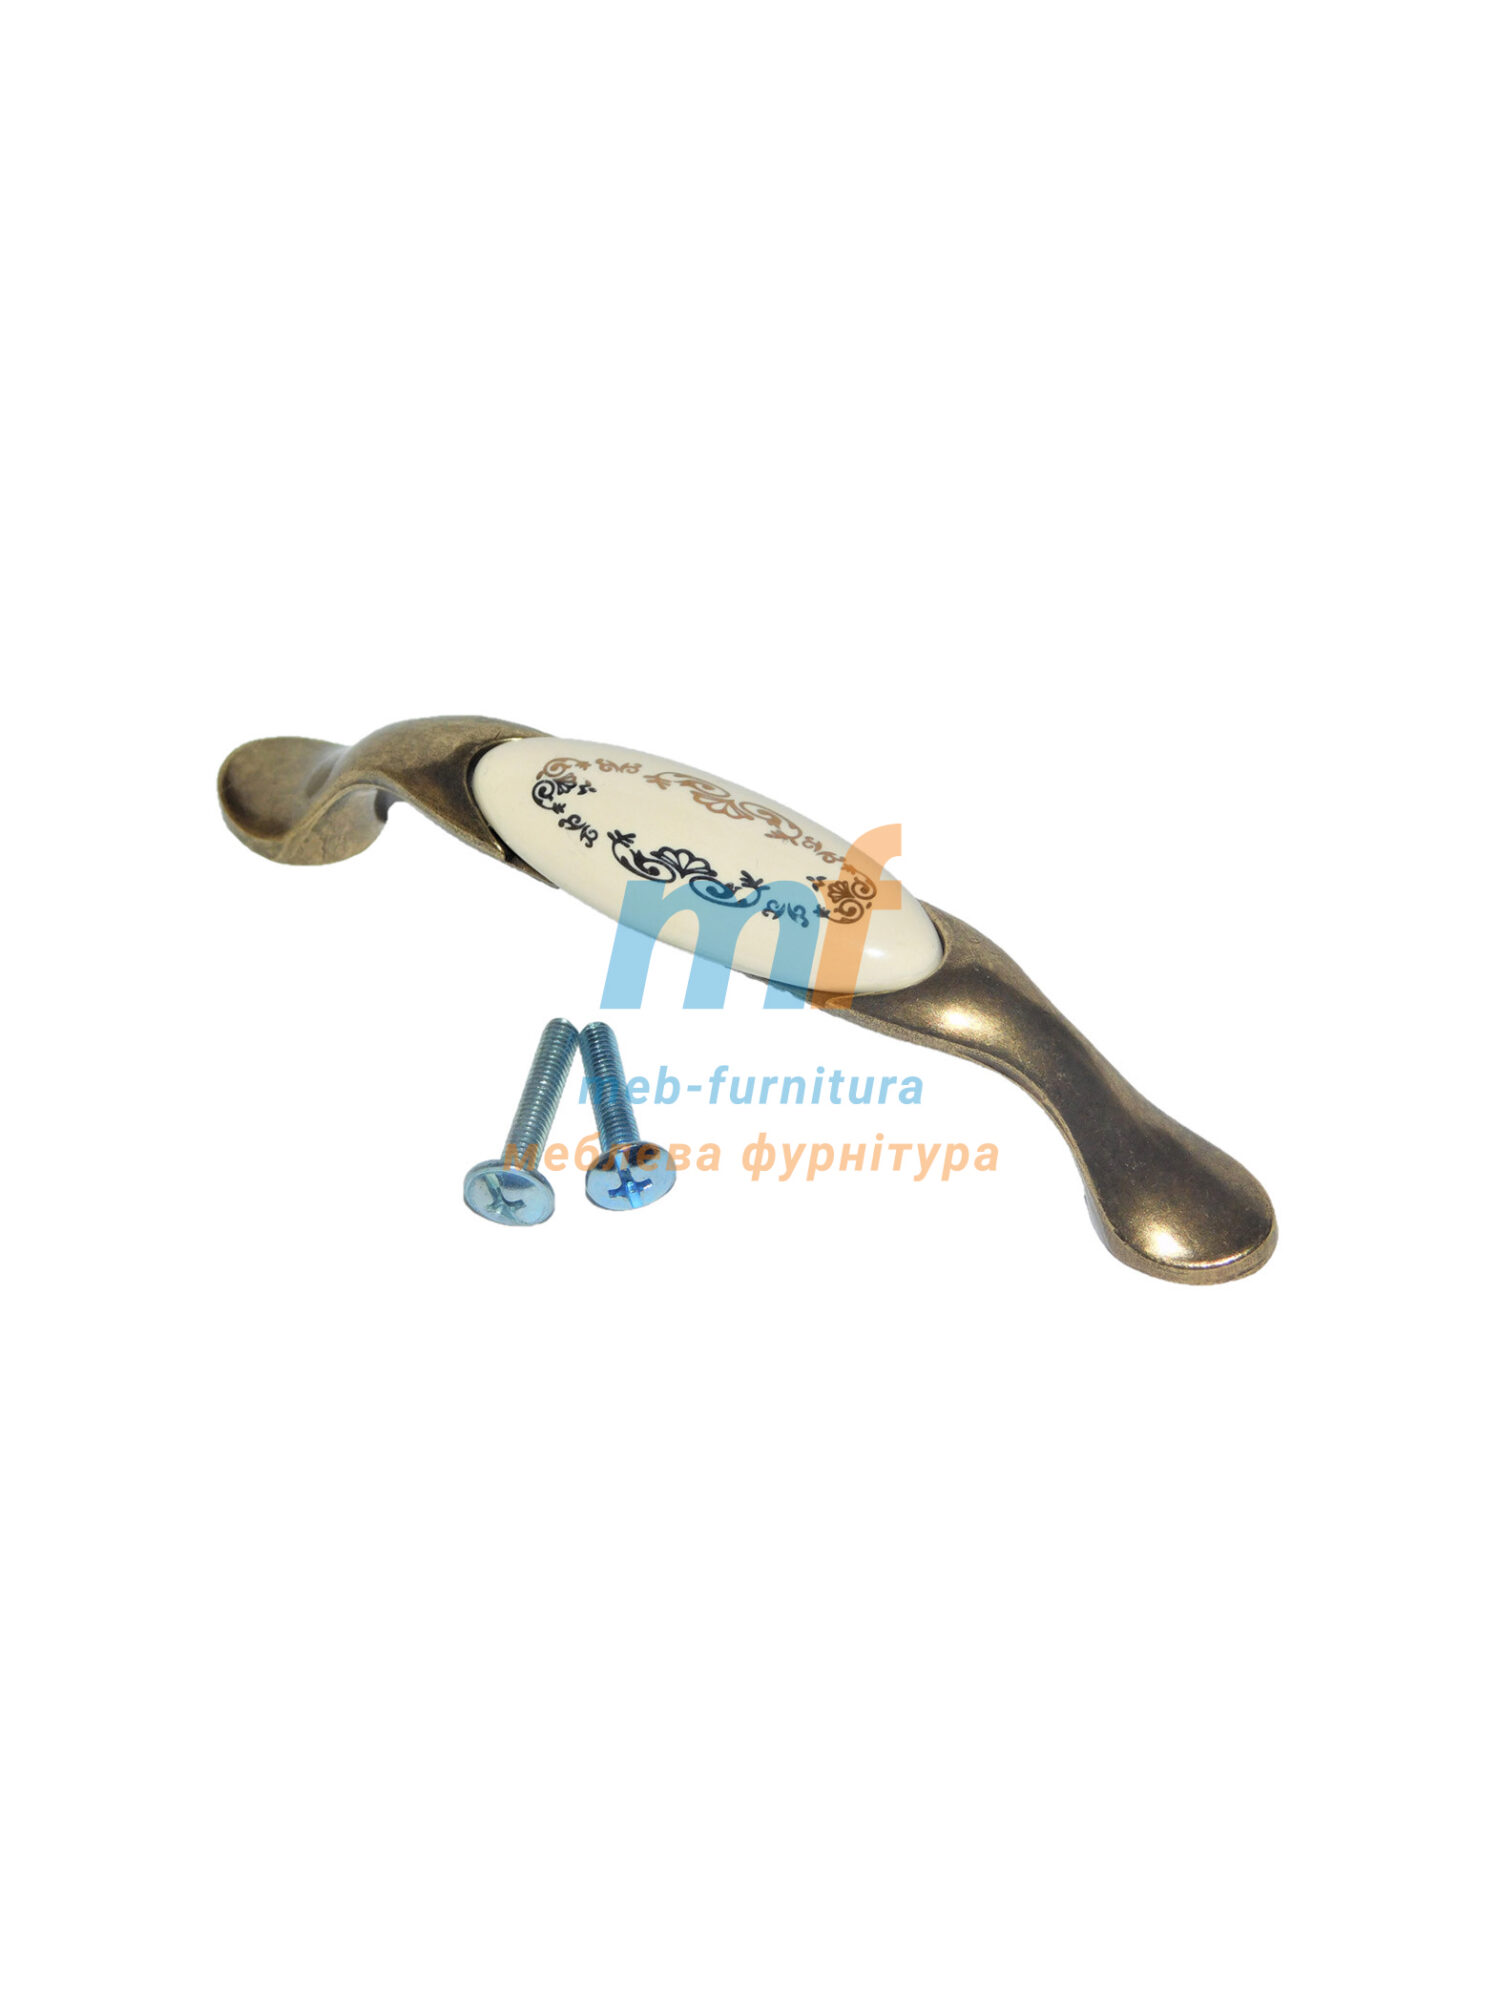 Ручка мебельная керамика KR-13-96mm